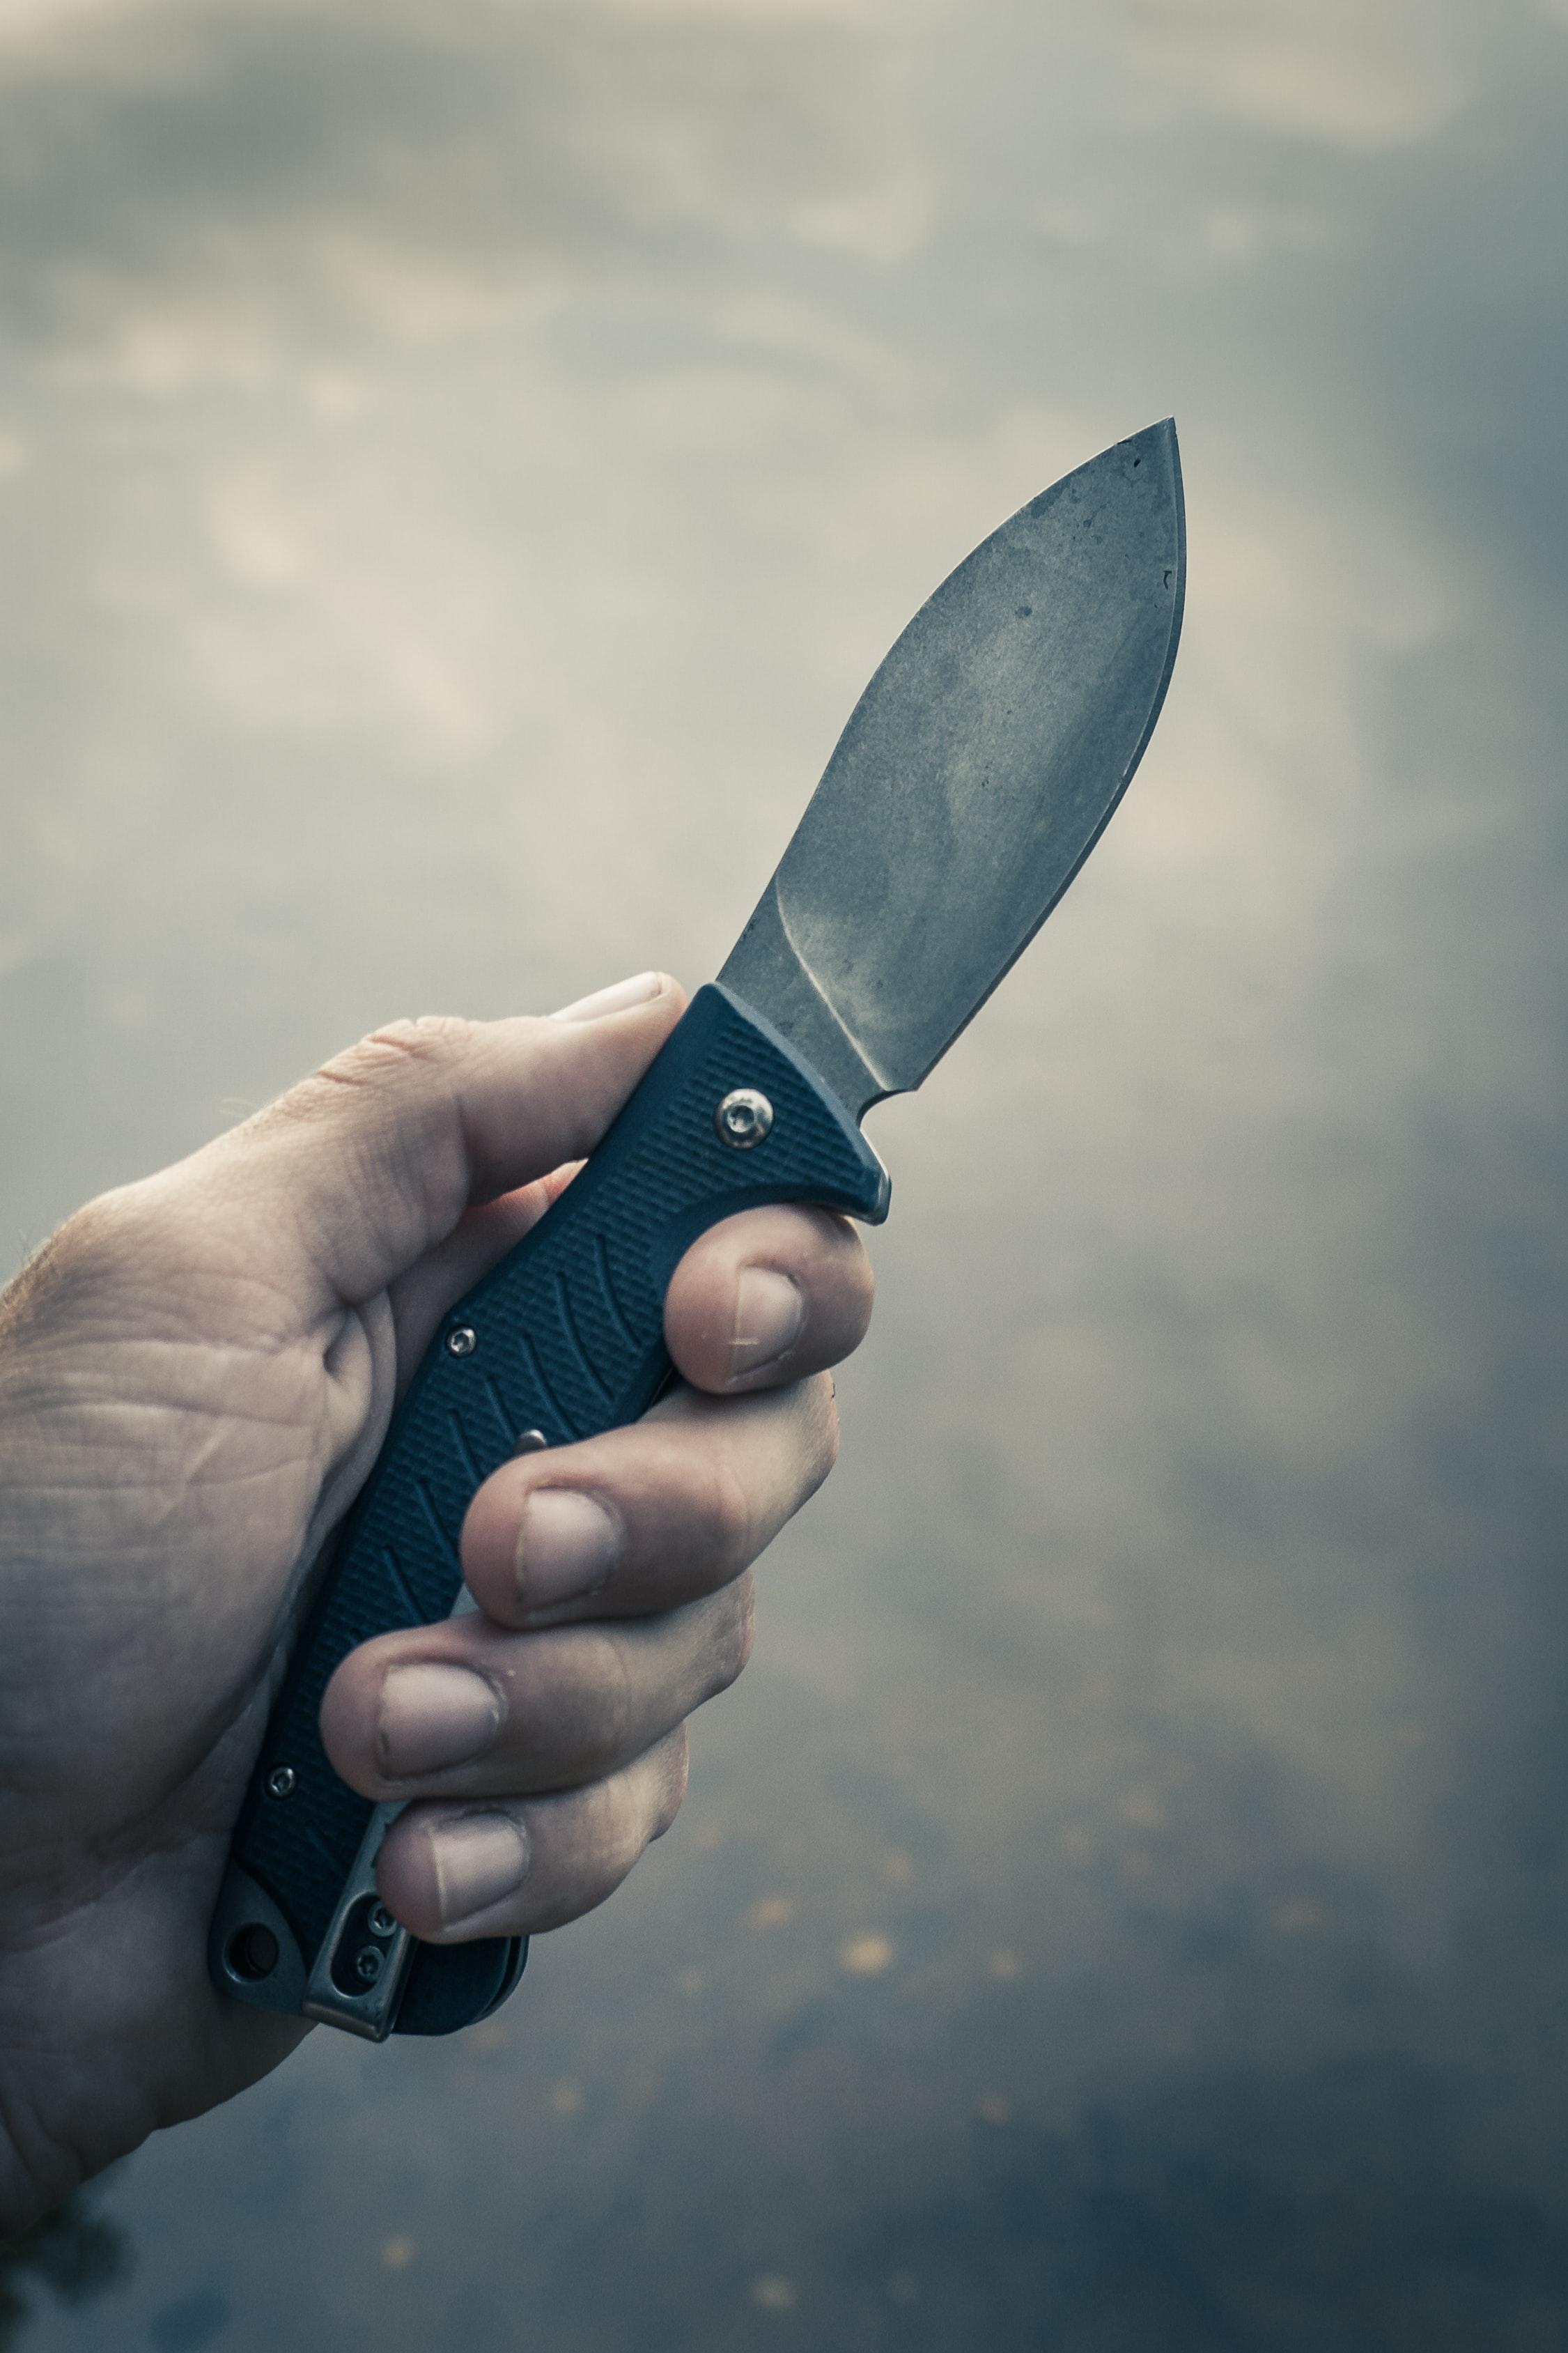 Endure the Cutting